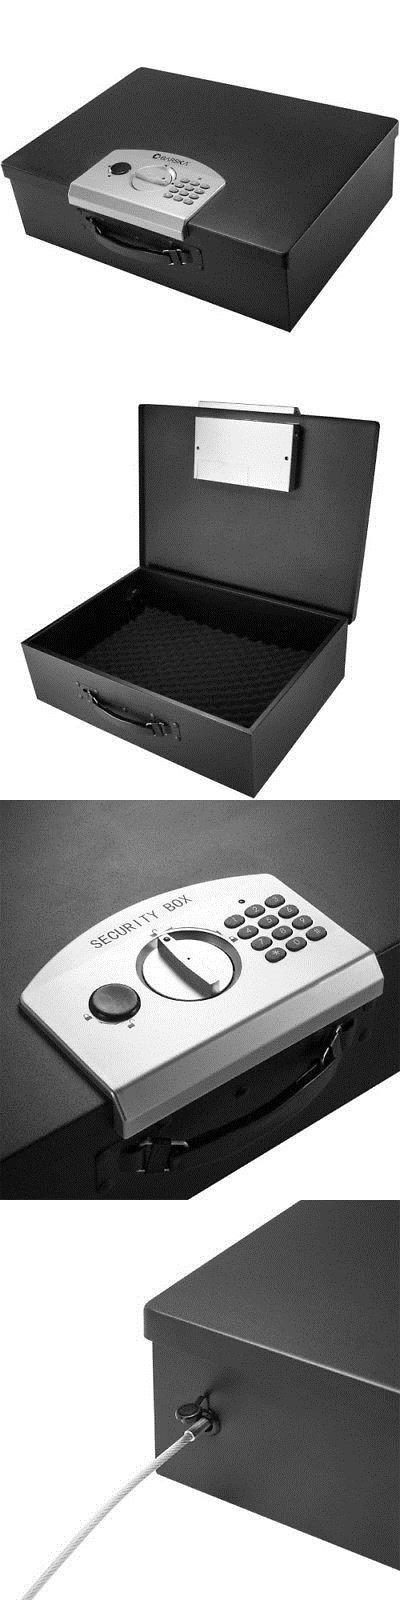 Cabinets and Safes 177877: Barska Digital Portable Keypad Lock Box Ax11910 -> BUY IT NOW ONLY: $61.95 on eBay!